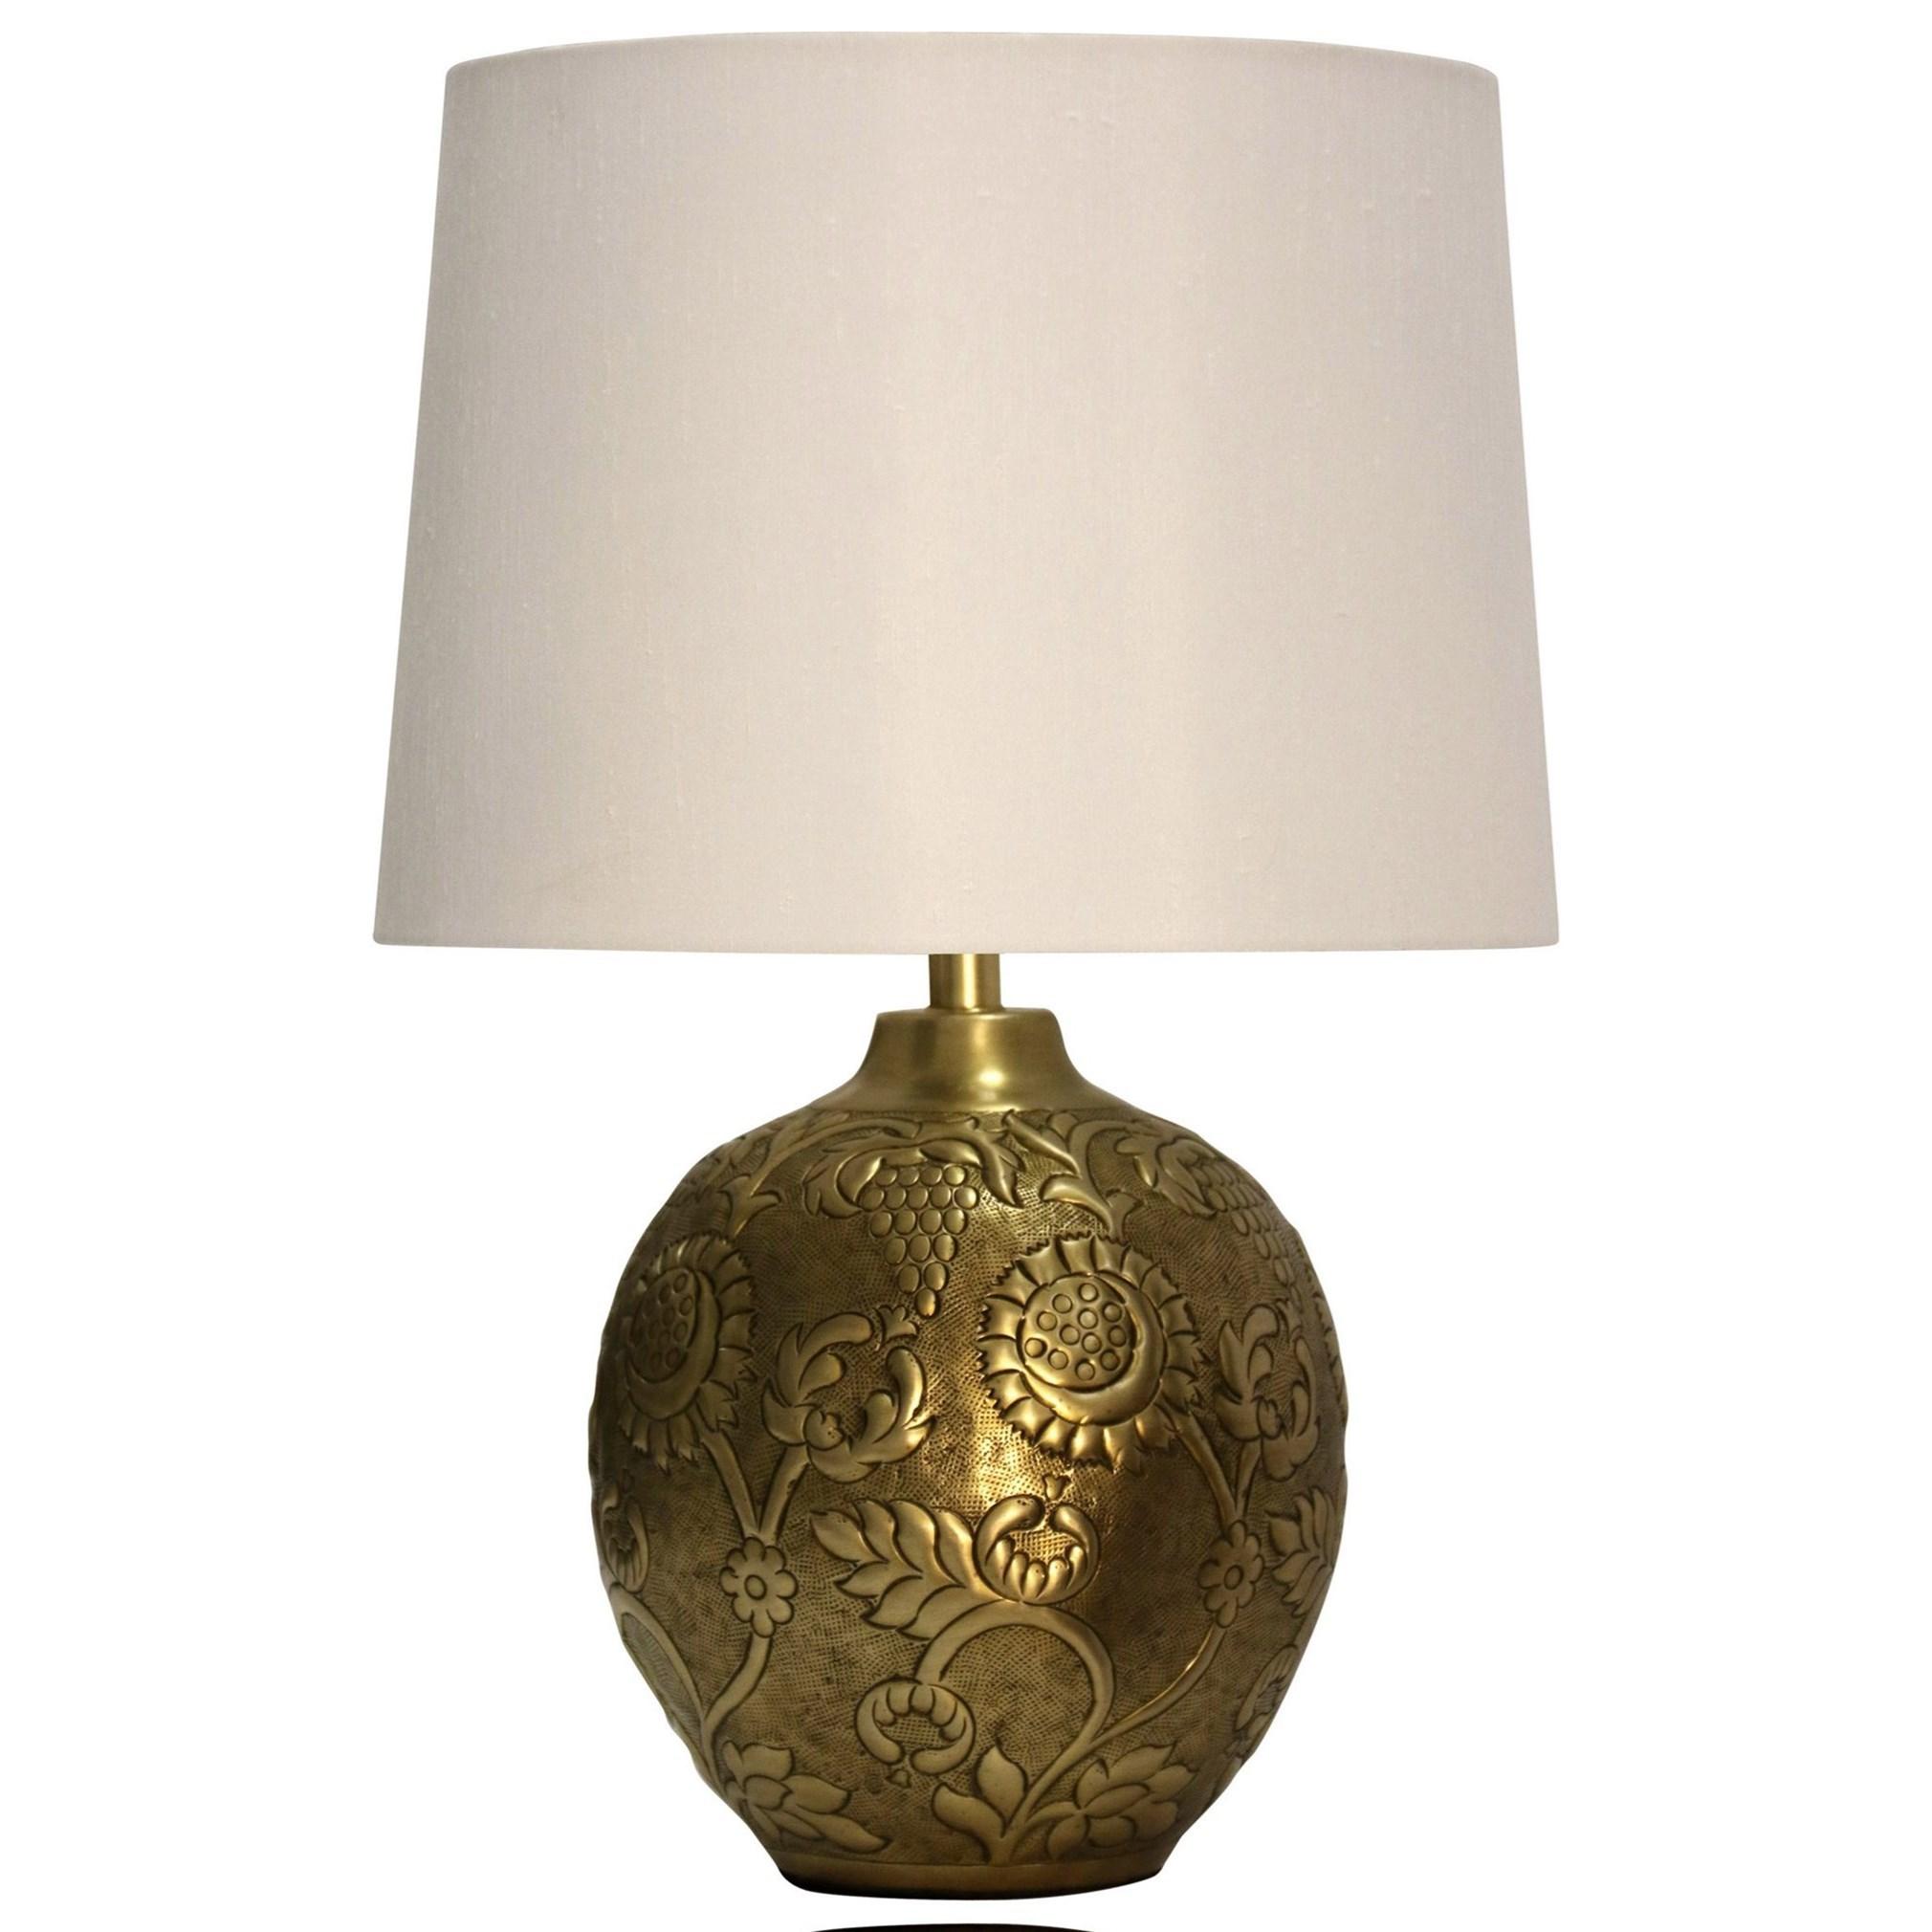 Lamps Antique Embossed Metal Lamp at Ruby Gordon Home